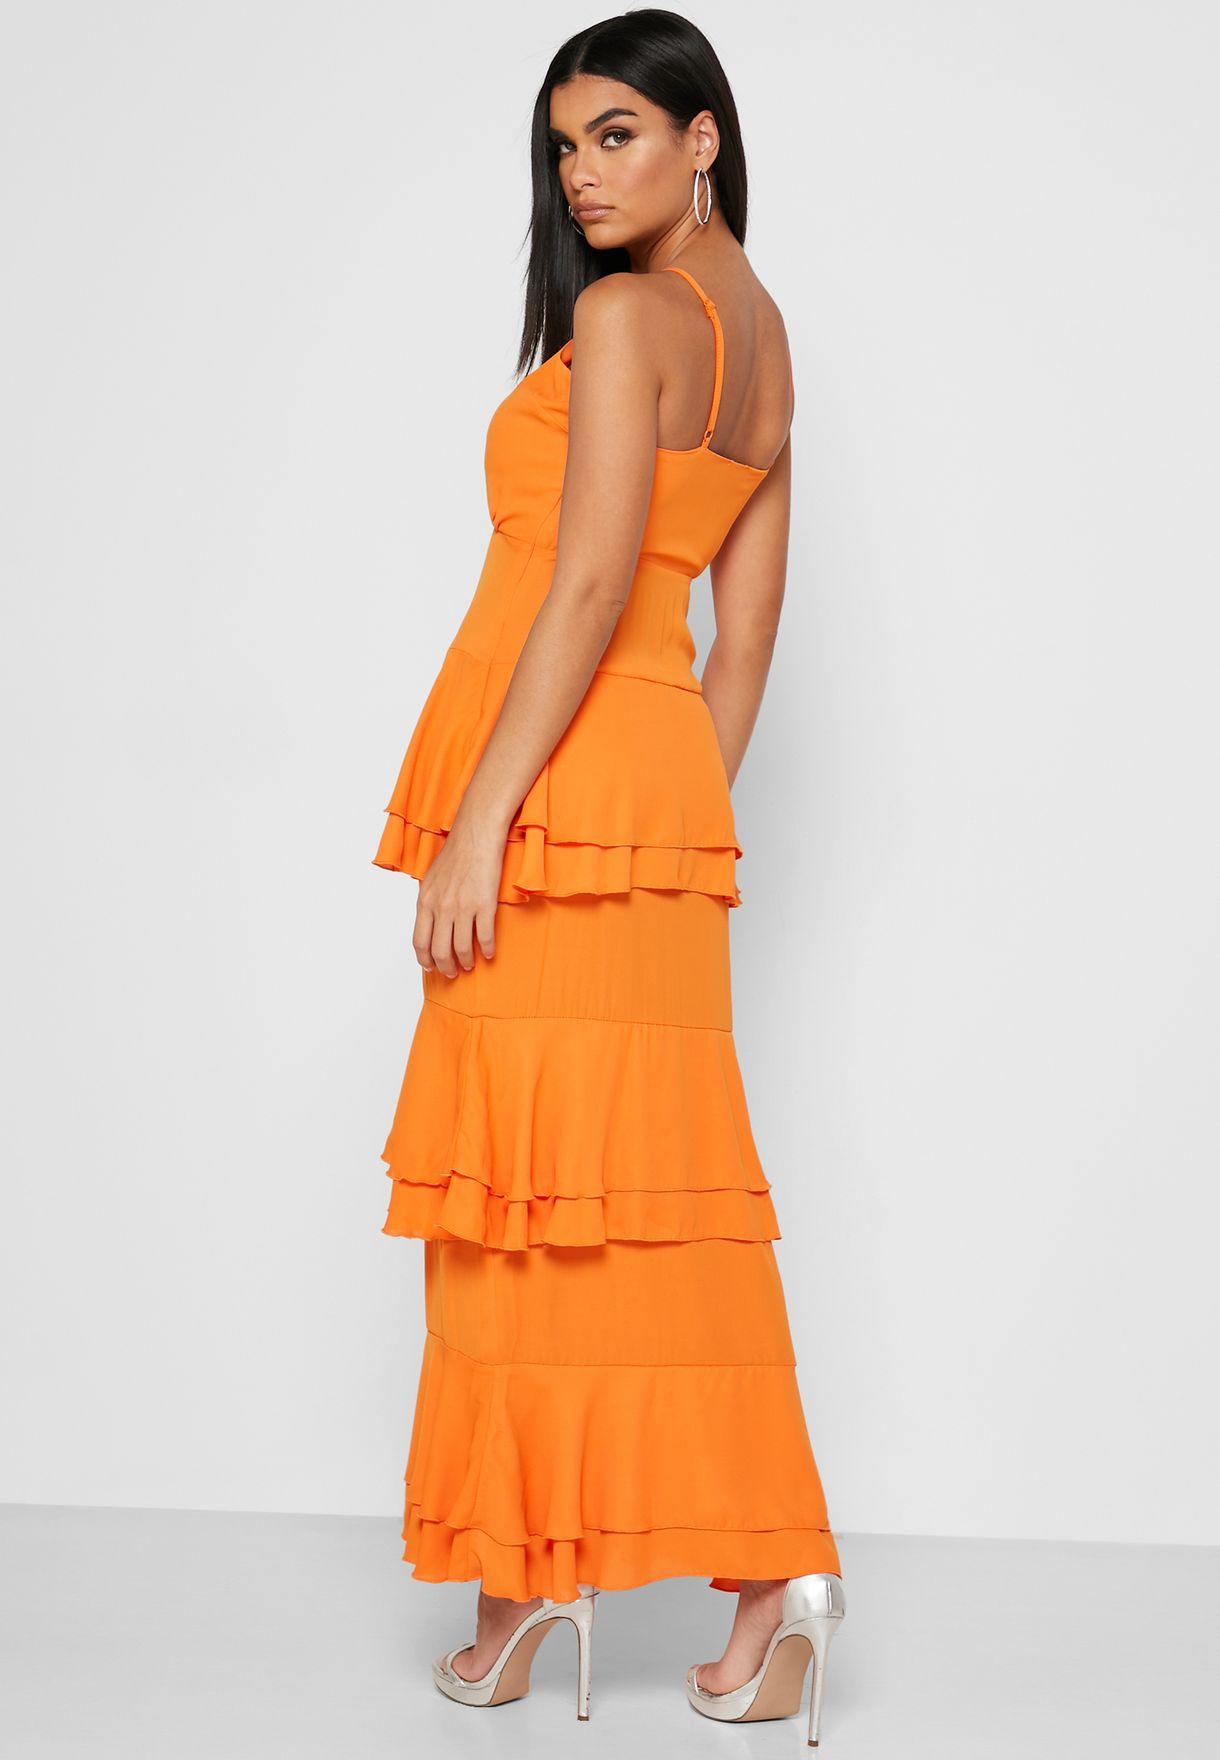 Cami Strap Layered Plunge Dress